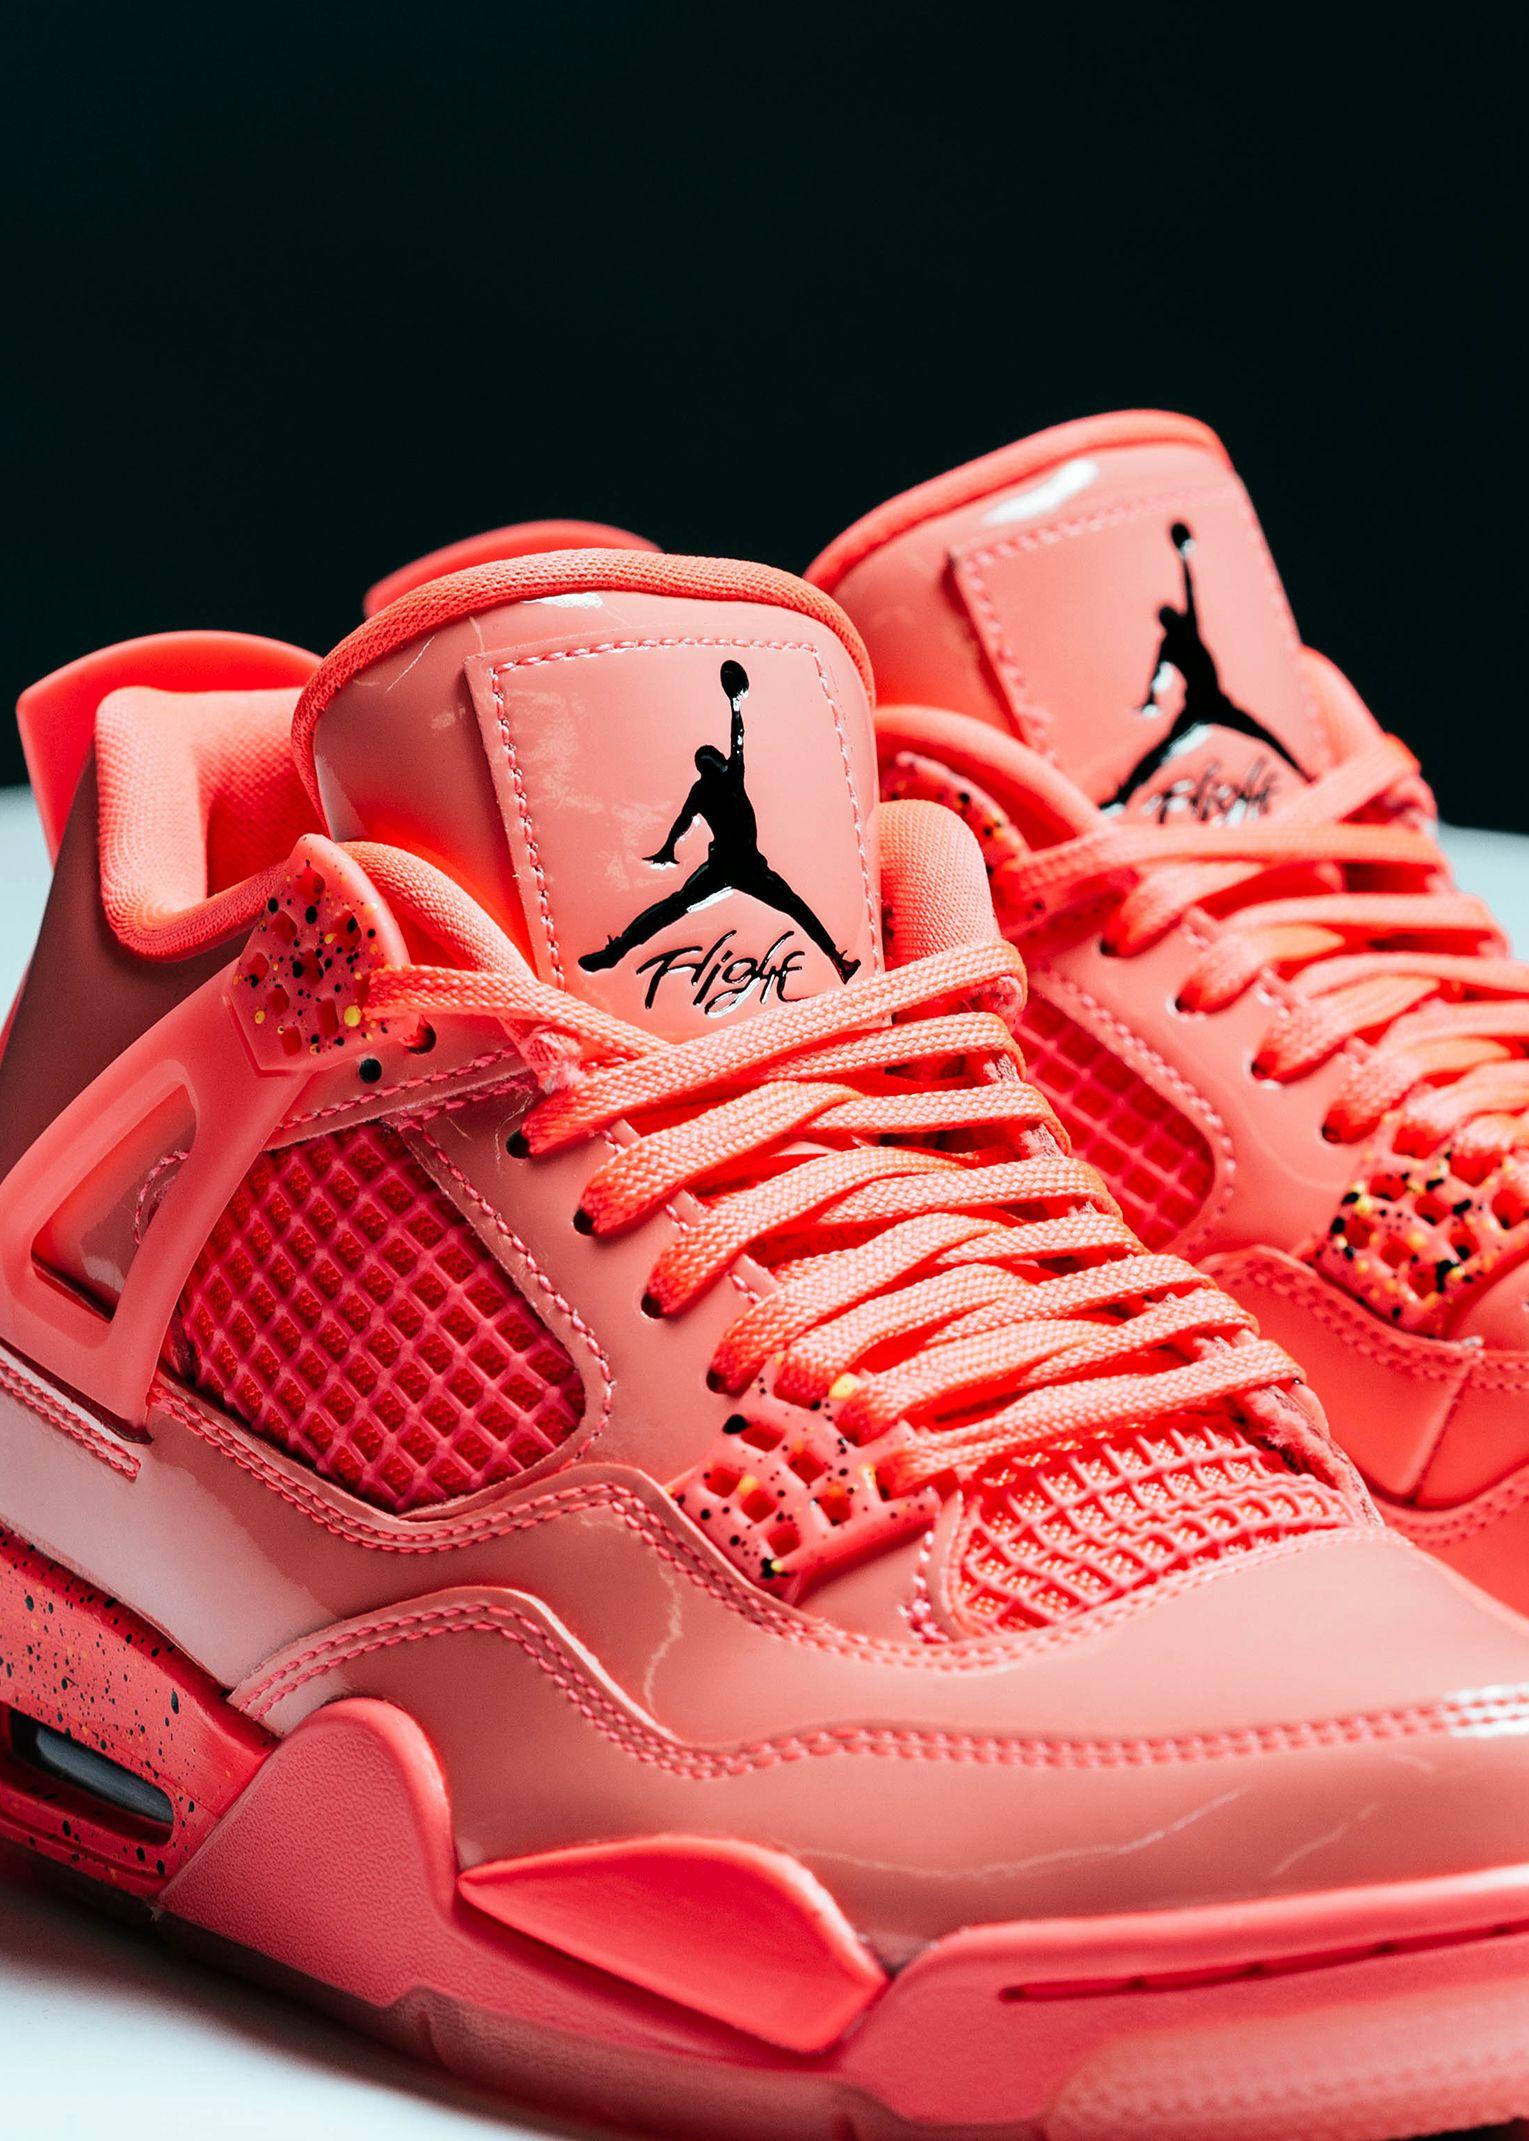 best wholesaler 1a0ac 41c01 Air Jordan Retro 4 Womens NRG